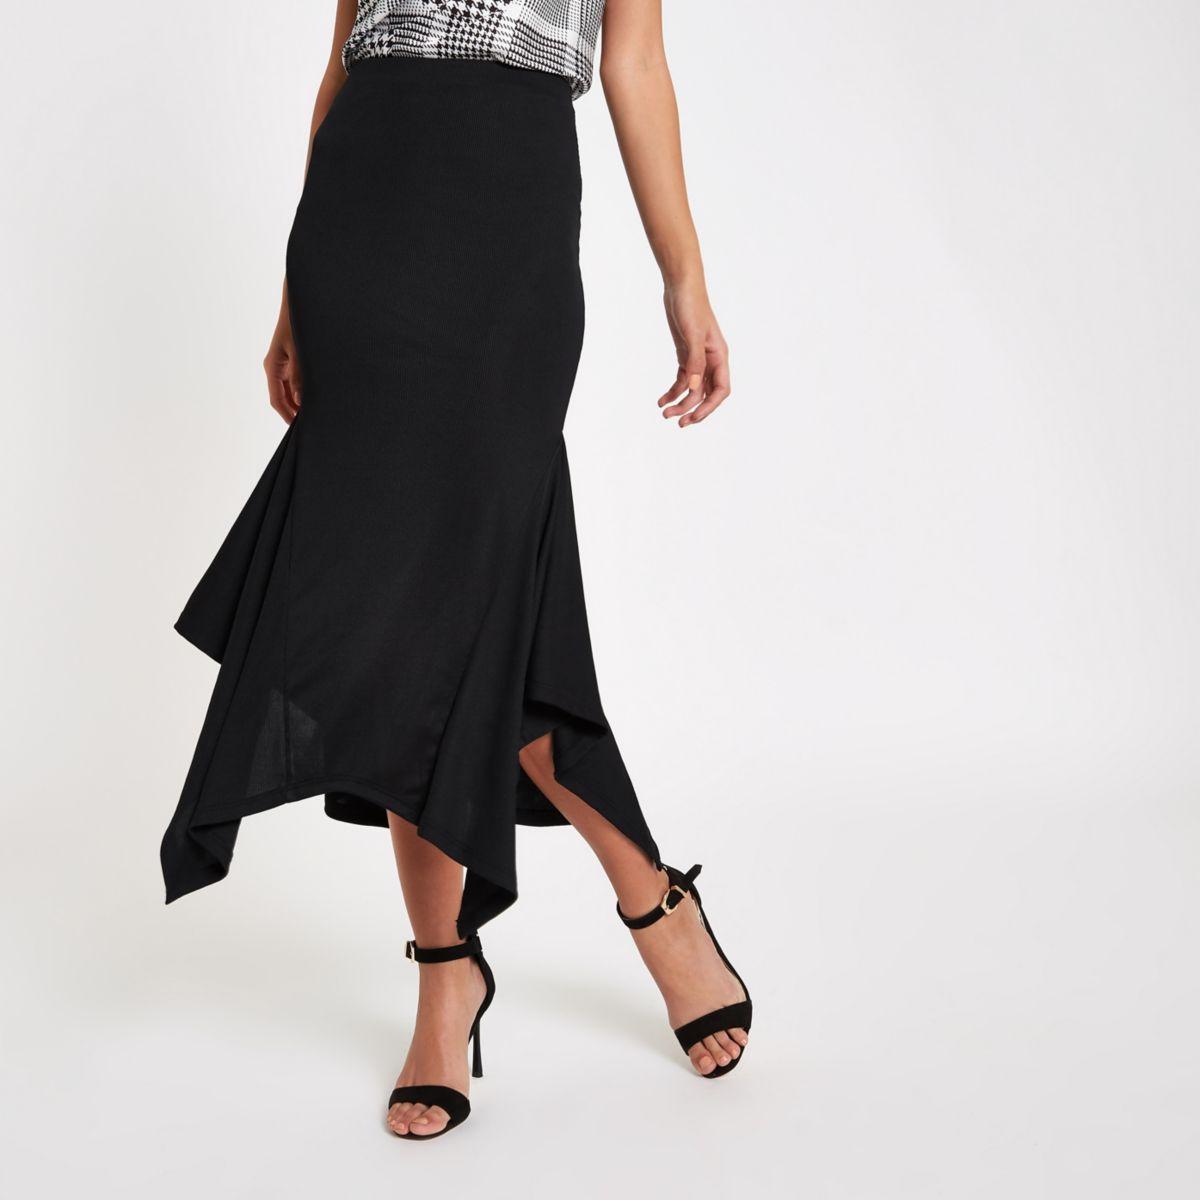 Black ribbed slinky side flare midi skirt